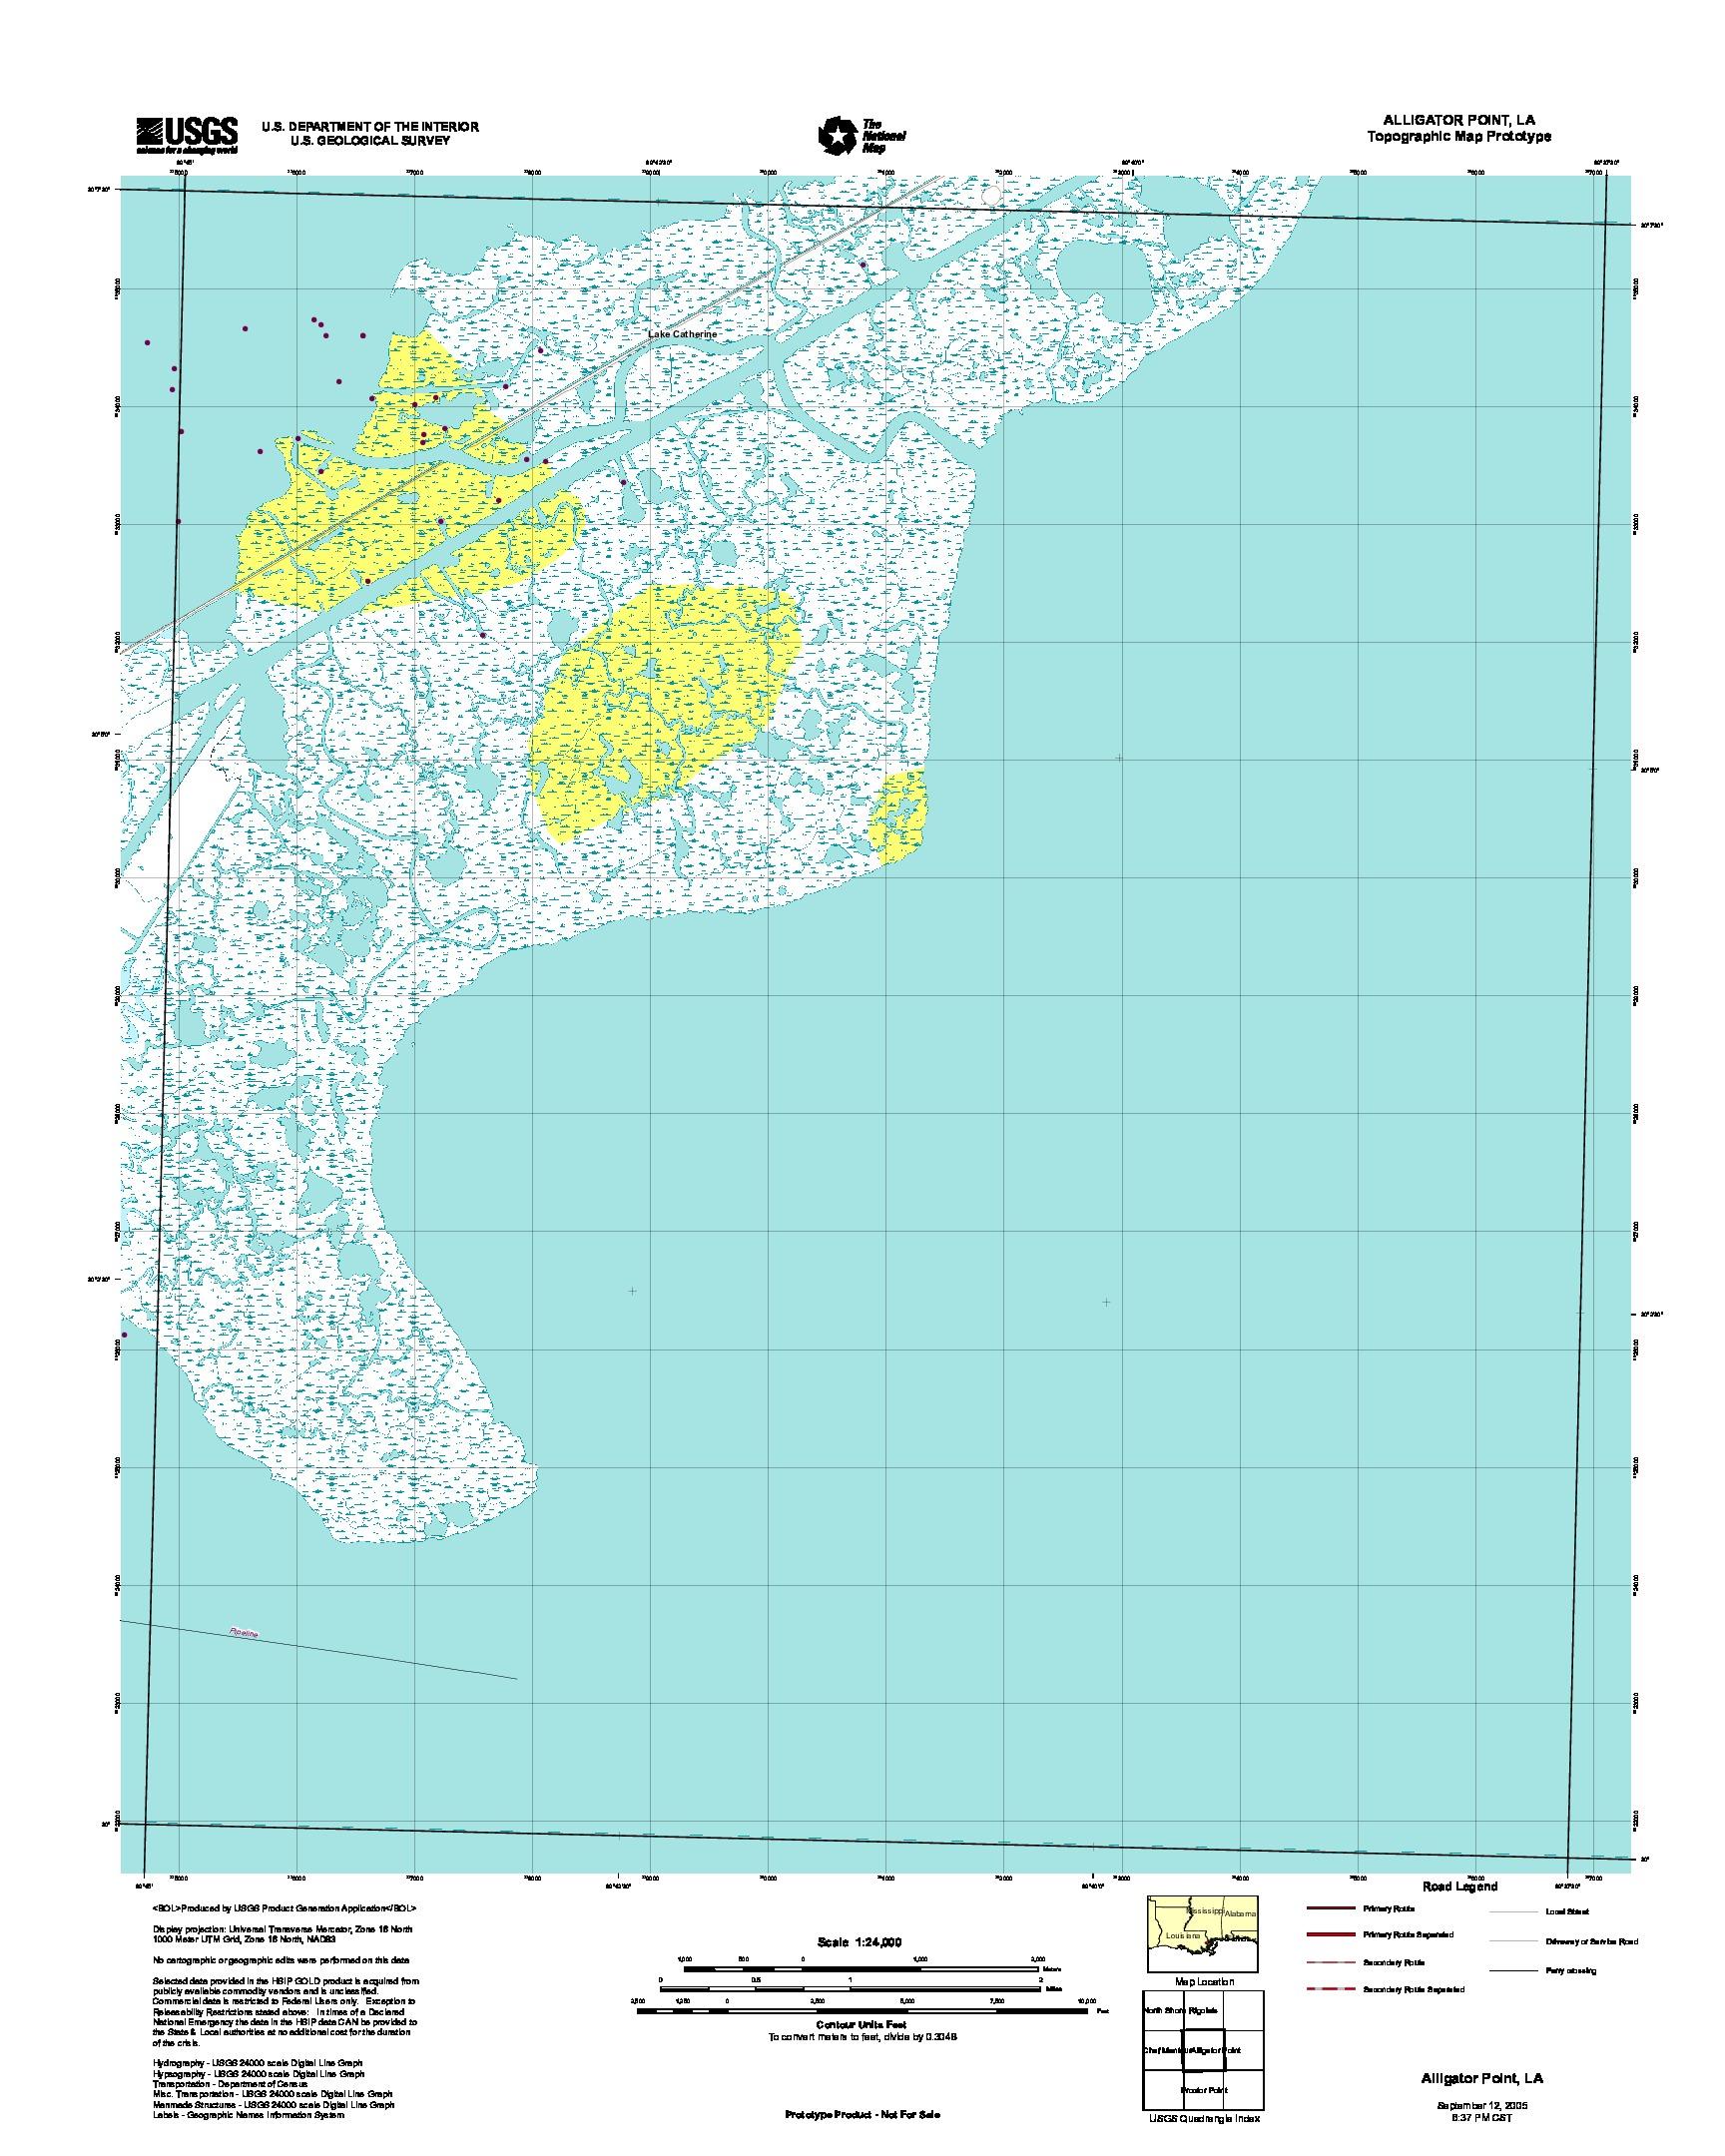 Alligator Point, Topographic Map Prototype, Louisiana, United States, September 12, 2005